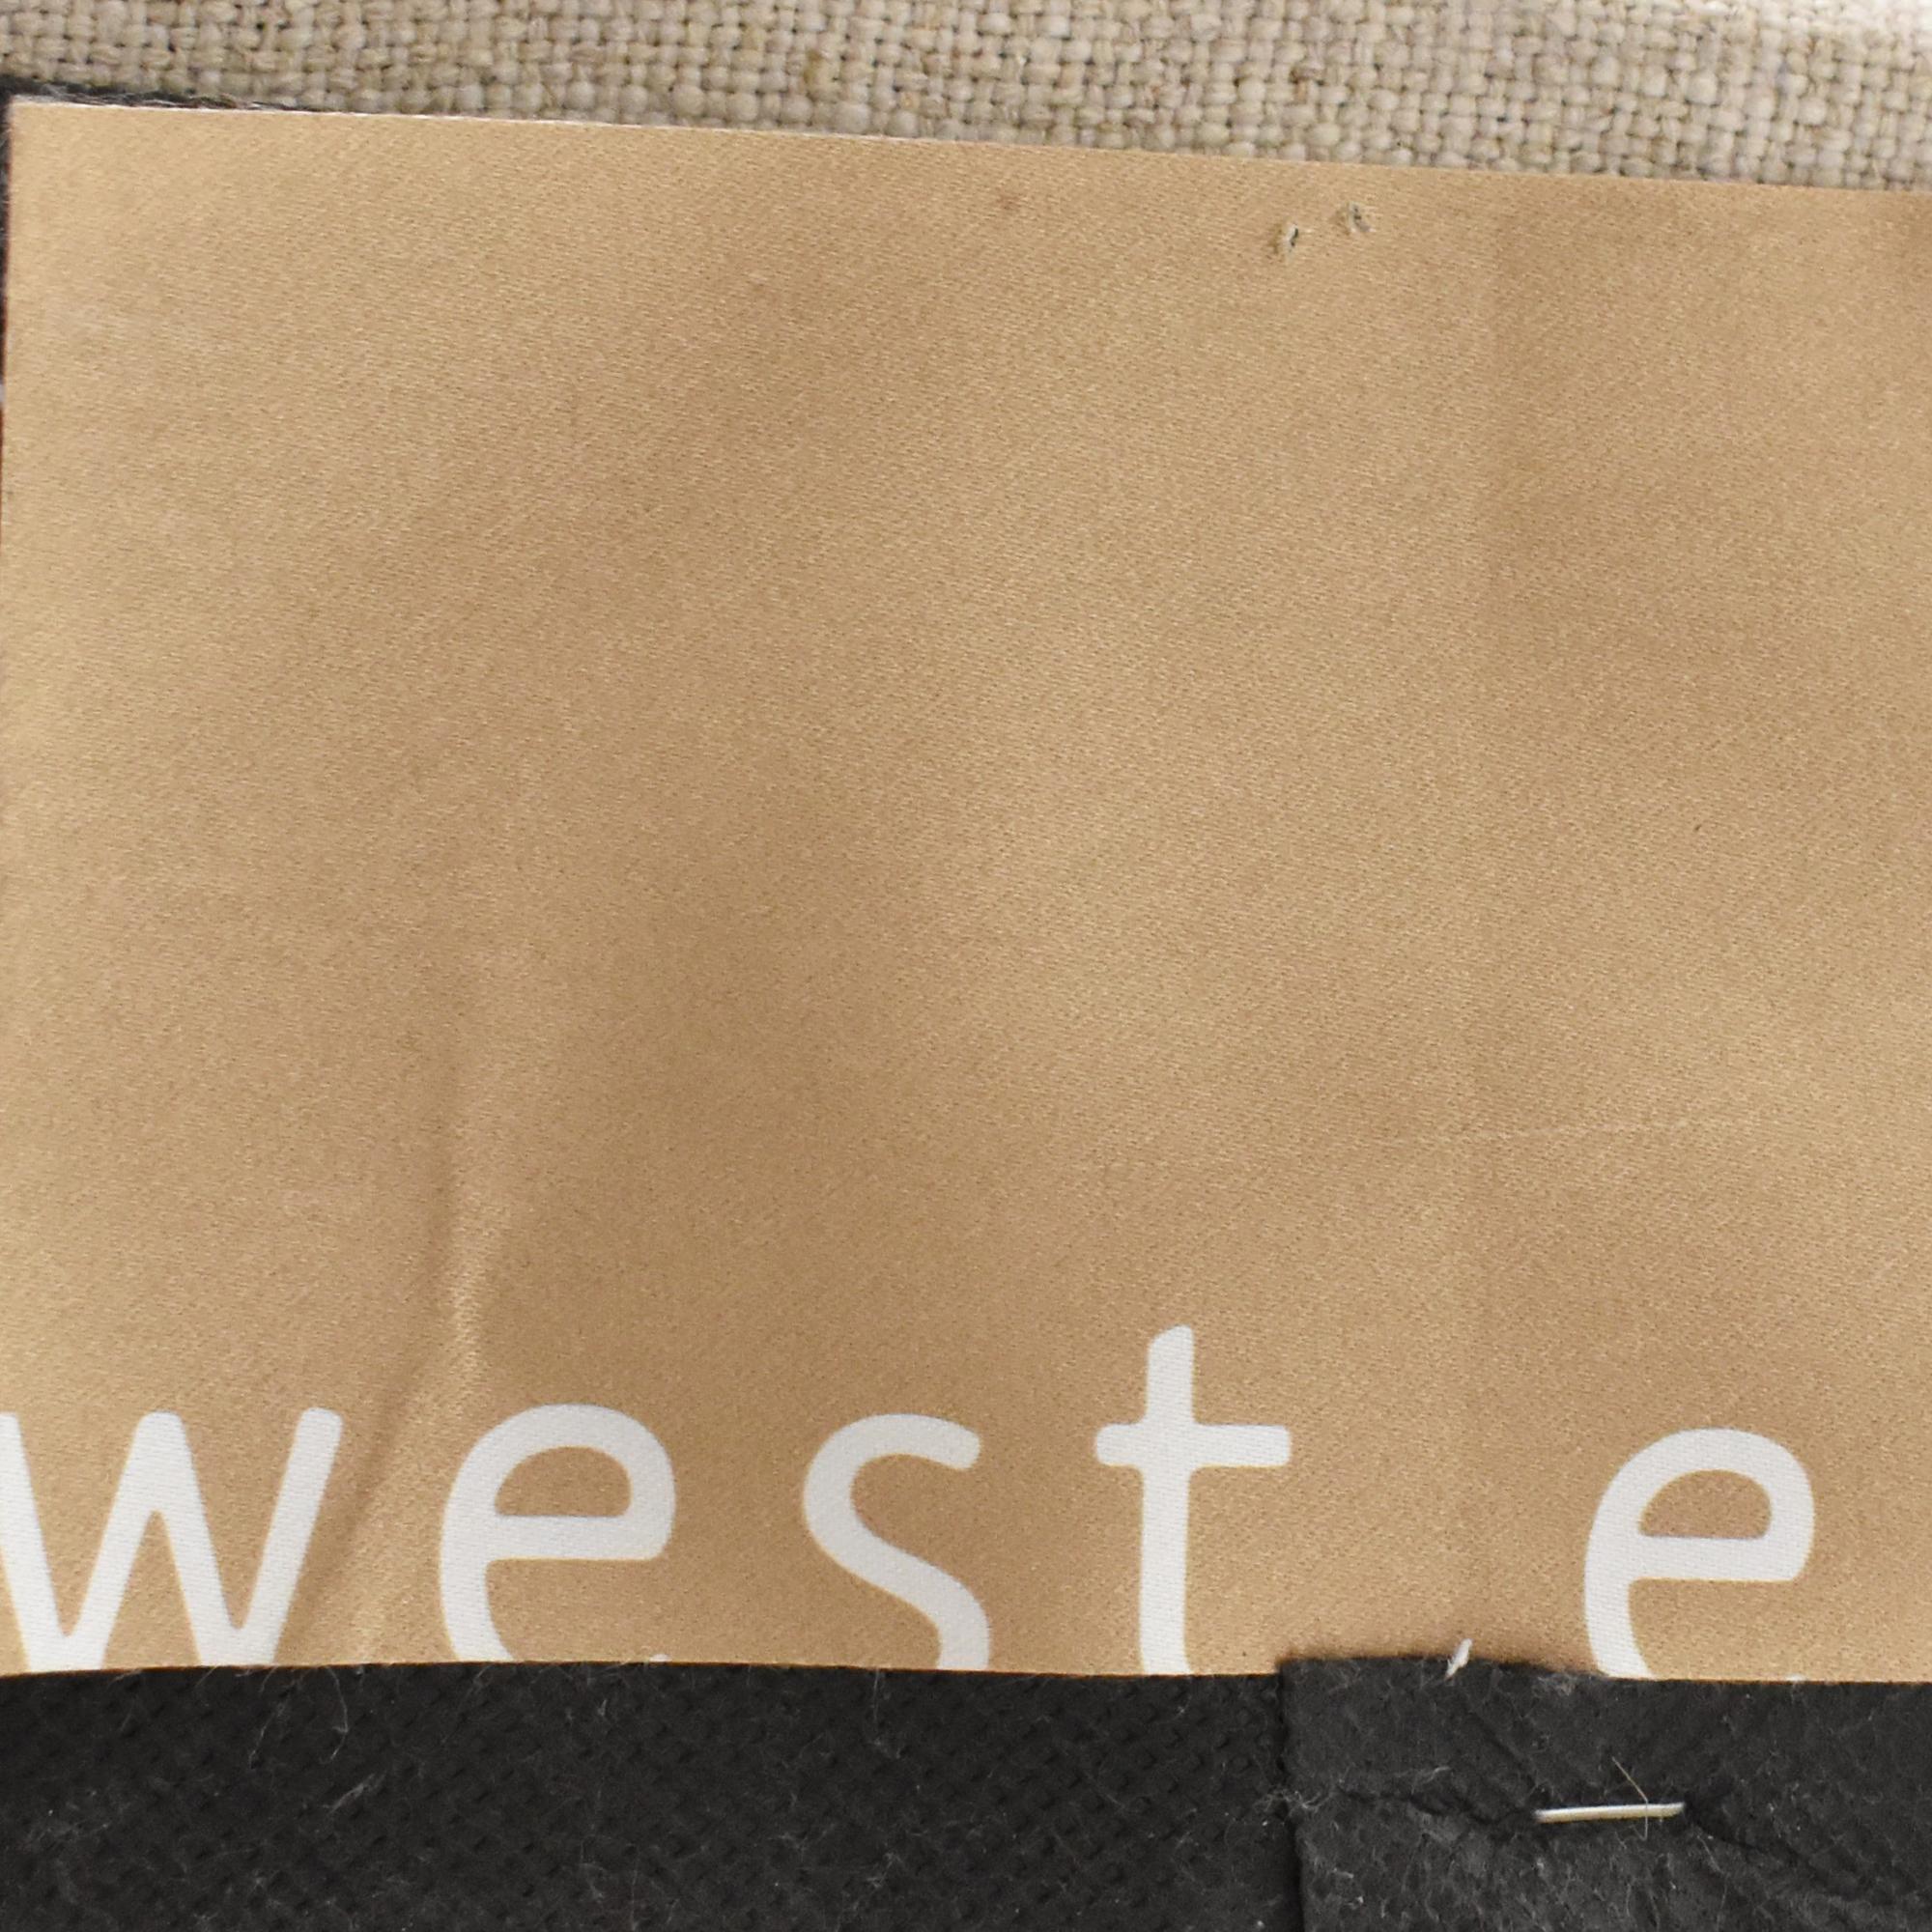 buy West Elm Grid Tufted Tall Queen Headboard West Elm Beds